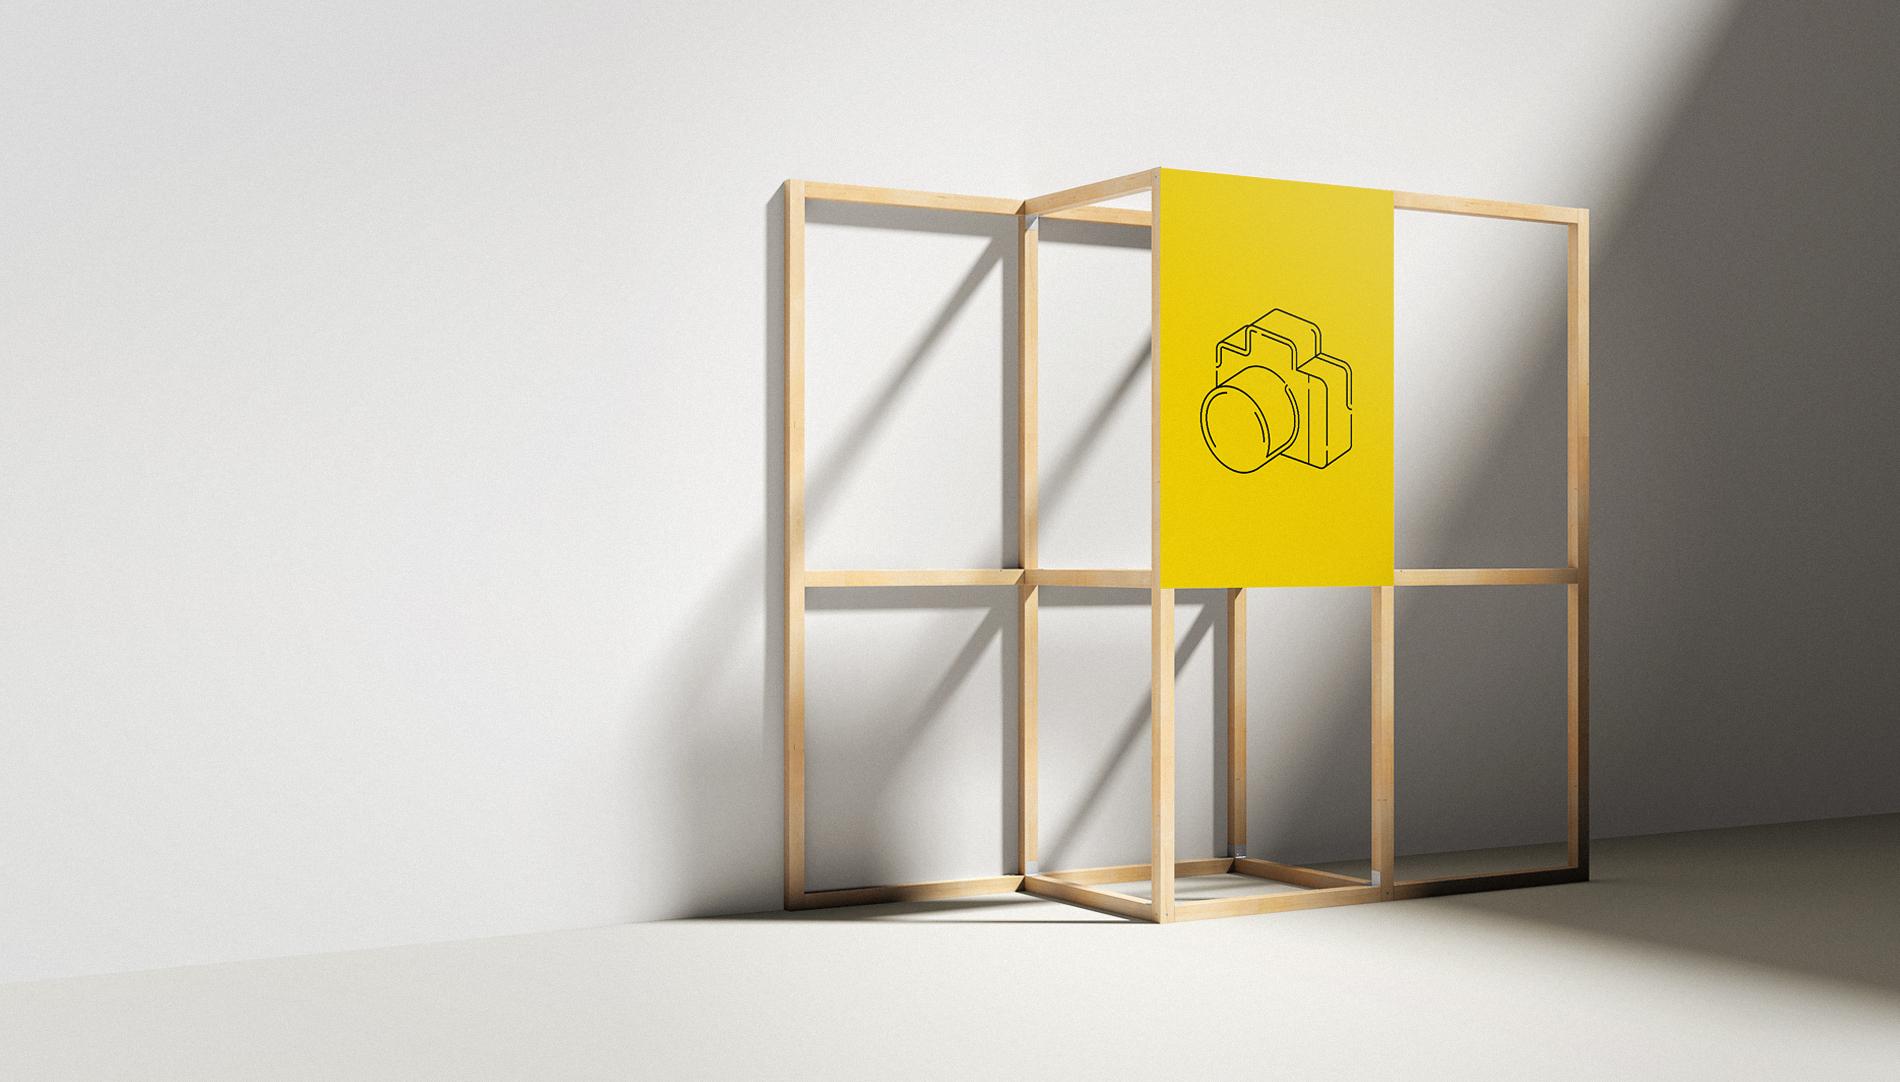 Fabio-Bevilacqua-b49-studio